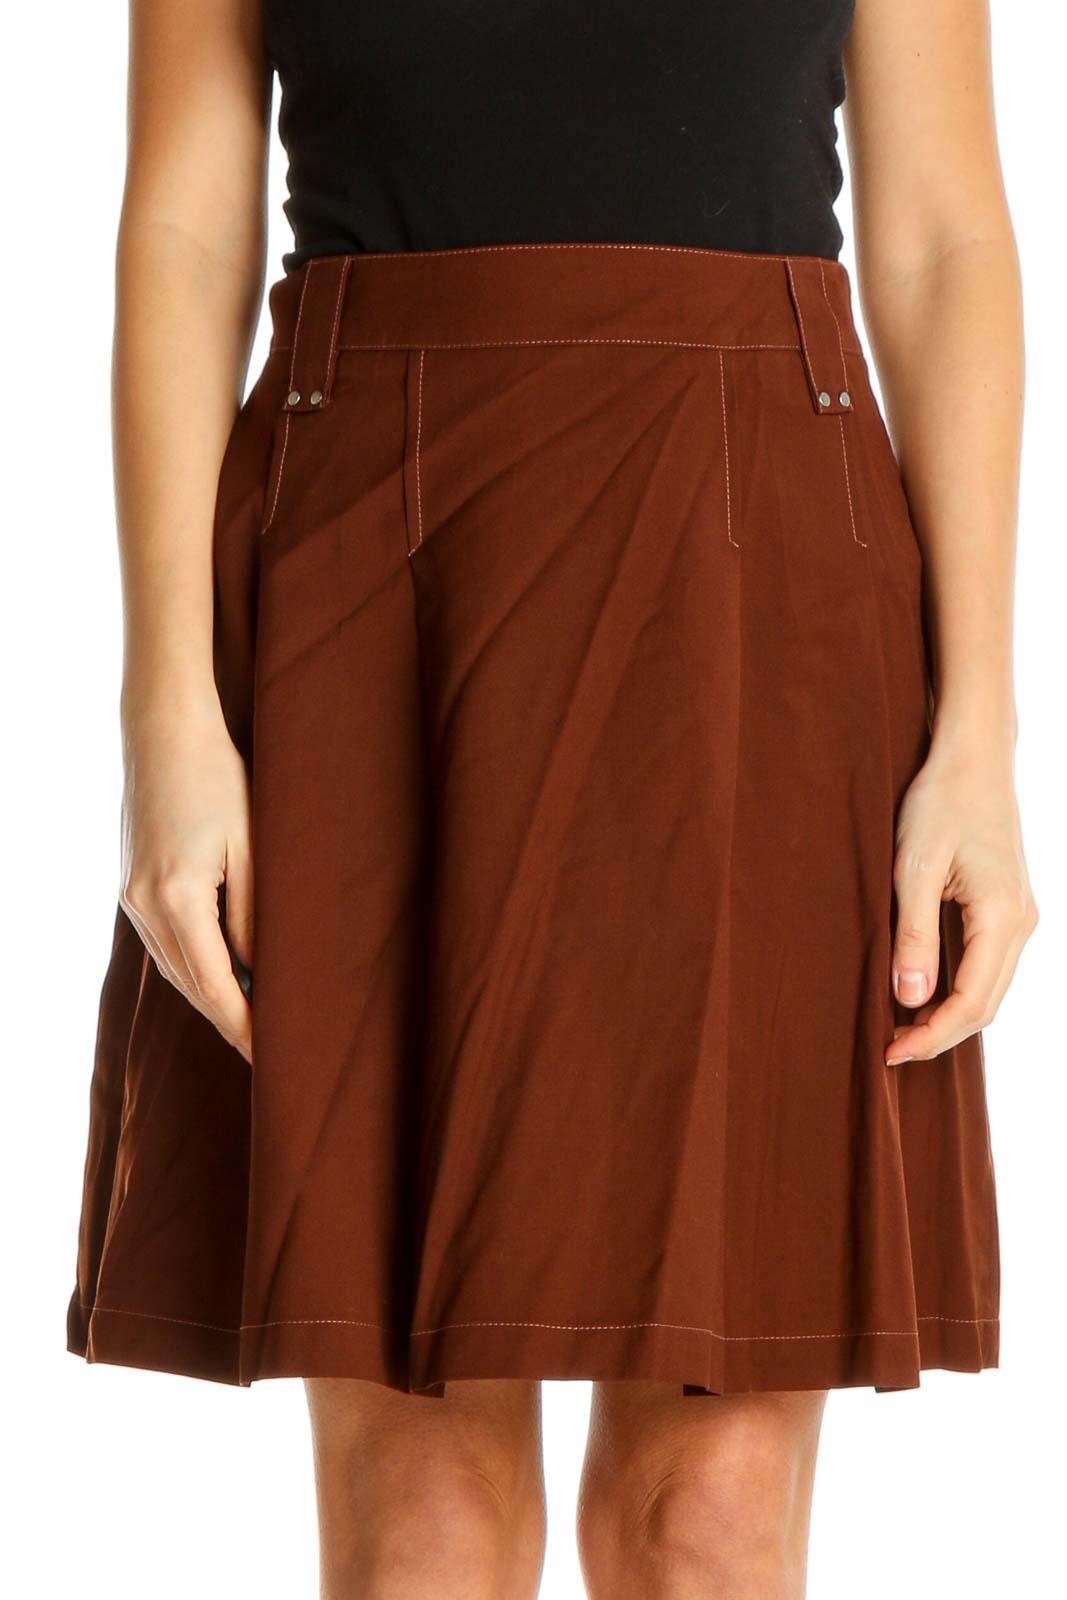 Brown Solid Brunch Flared Skirt Front